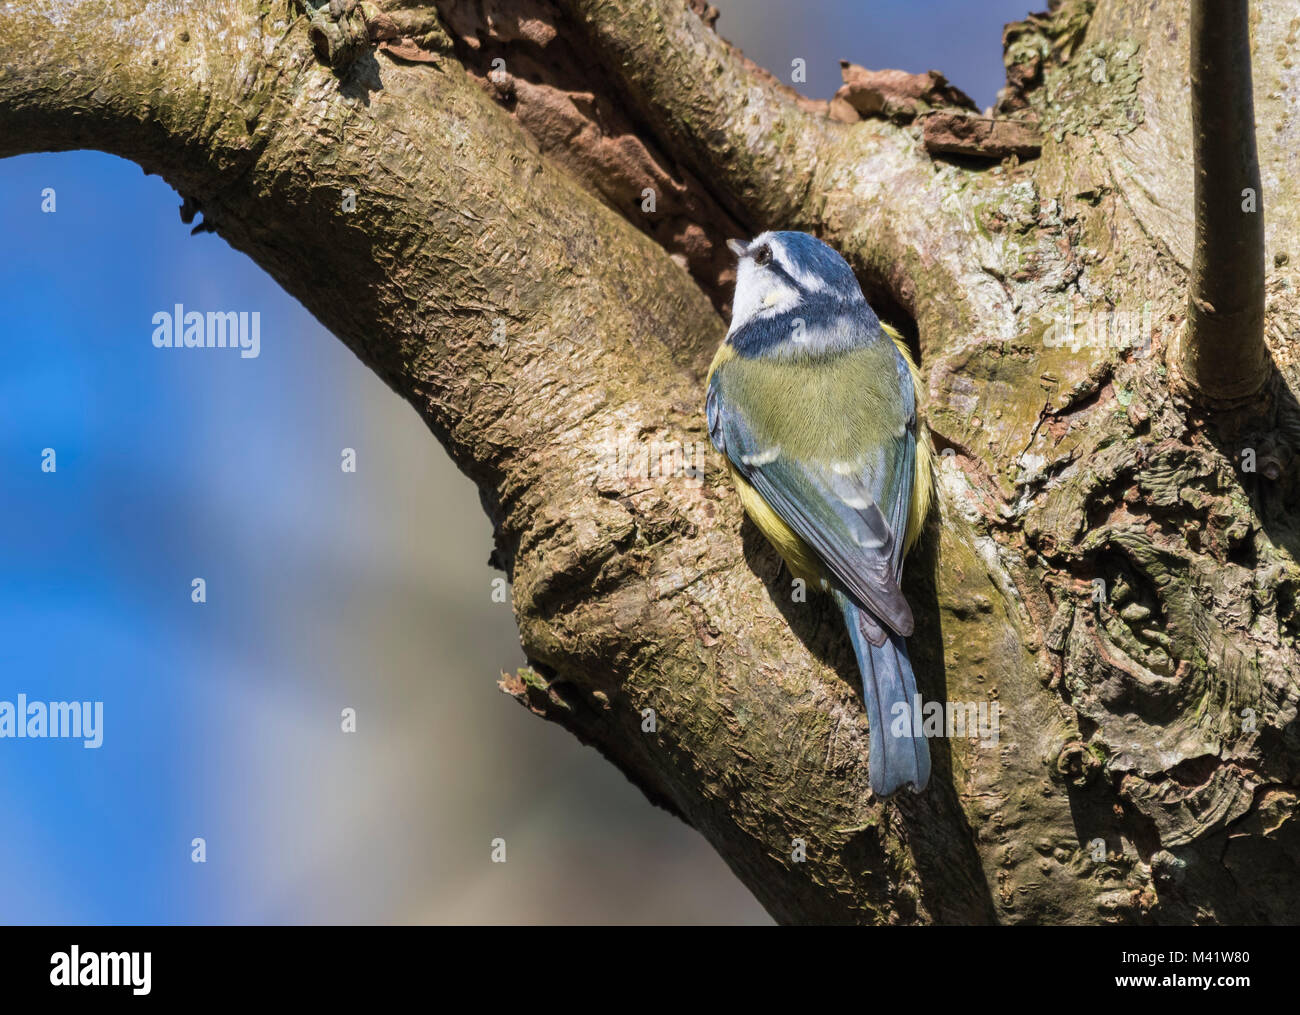 eurasian-blue-tit-bird-cyanistes-caeruleus-perched-on-a-tree-in-winter-M41W80.jpg